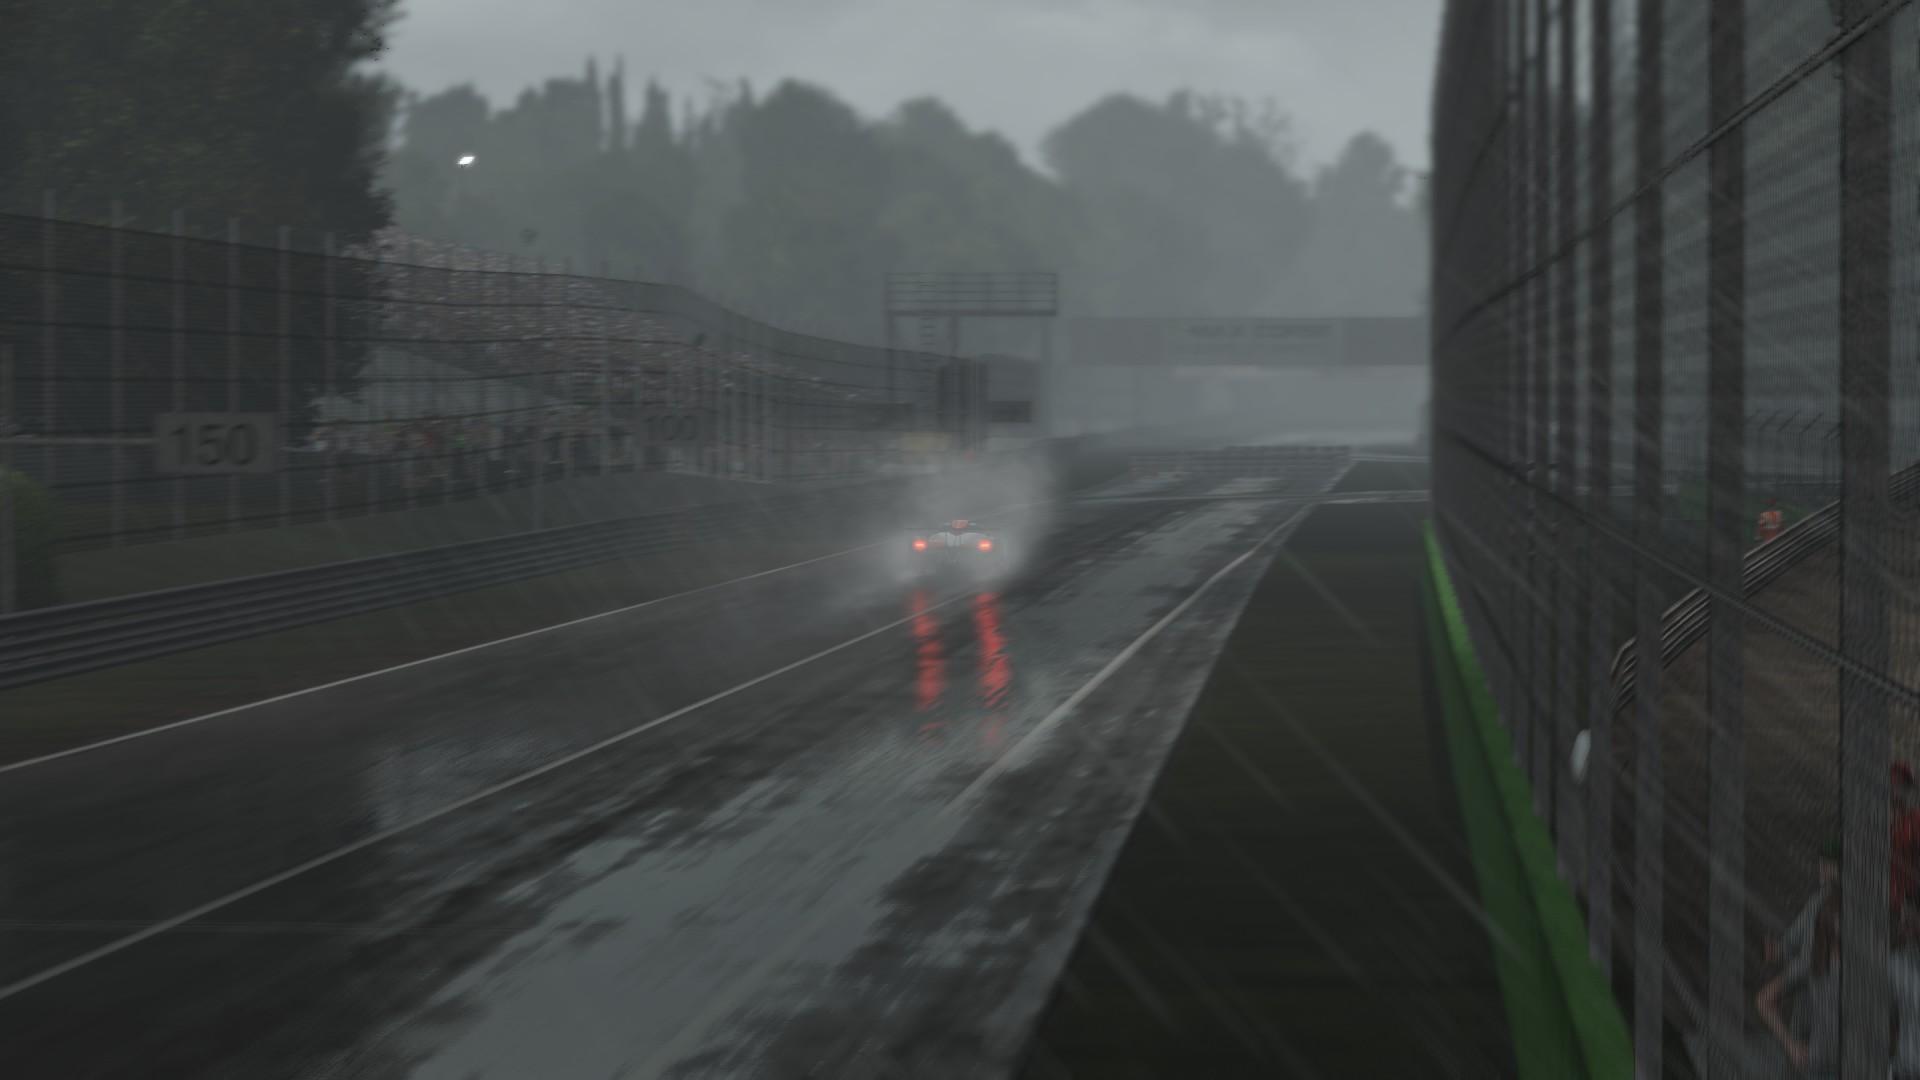 project-cars-pagani-zonda-pluie-00014